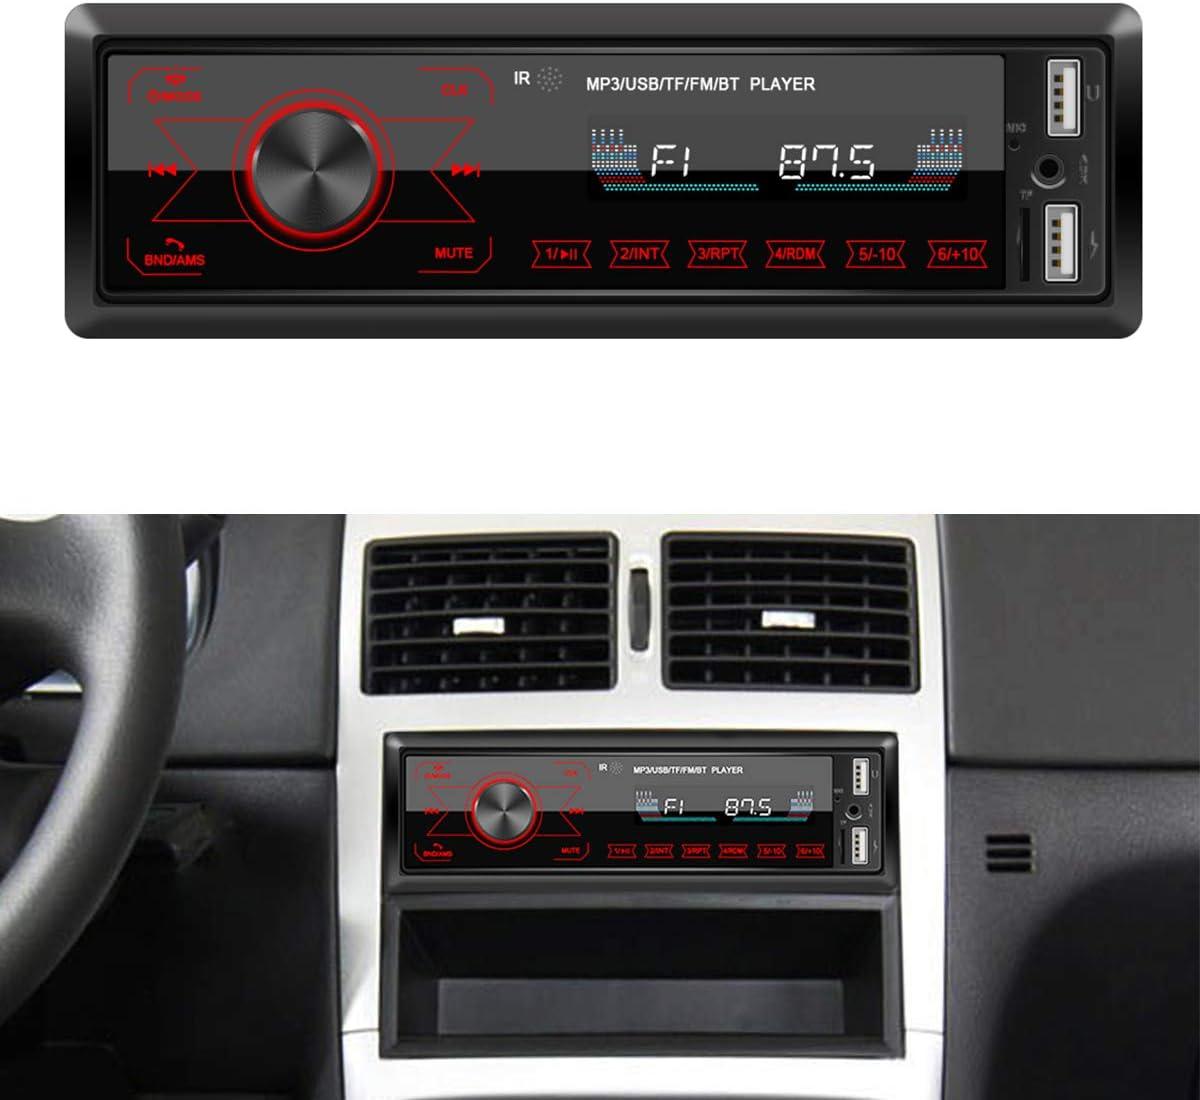 NON Radio del Coche Manos Libres Bluetooth Bluetooth Estéreo del Coche con Reproductor USB Y Mp3 Soporte BT Aux-In Music Play W/Mic